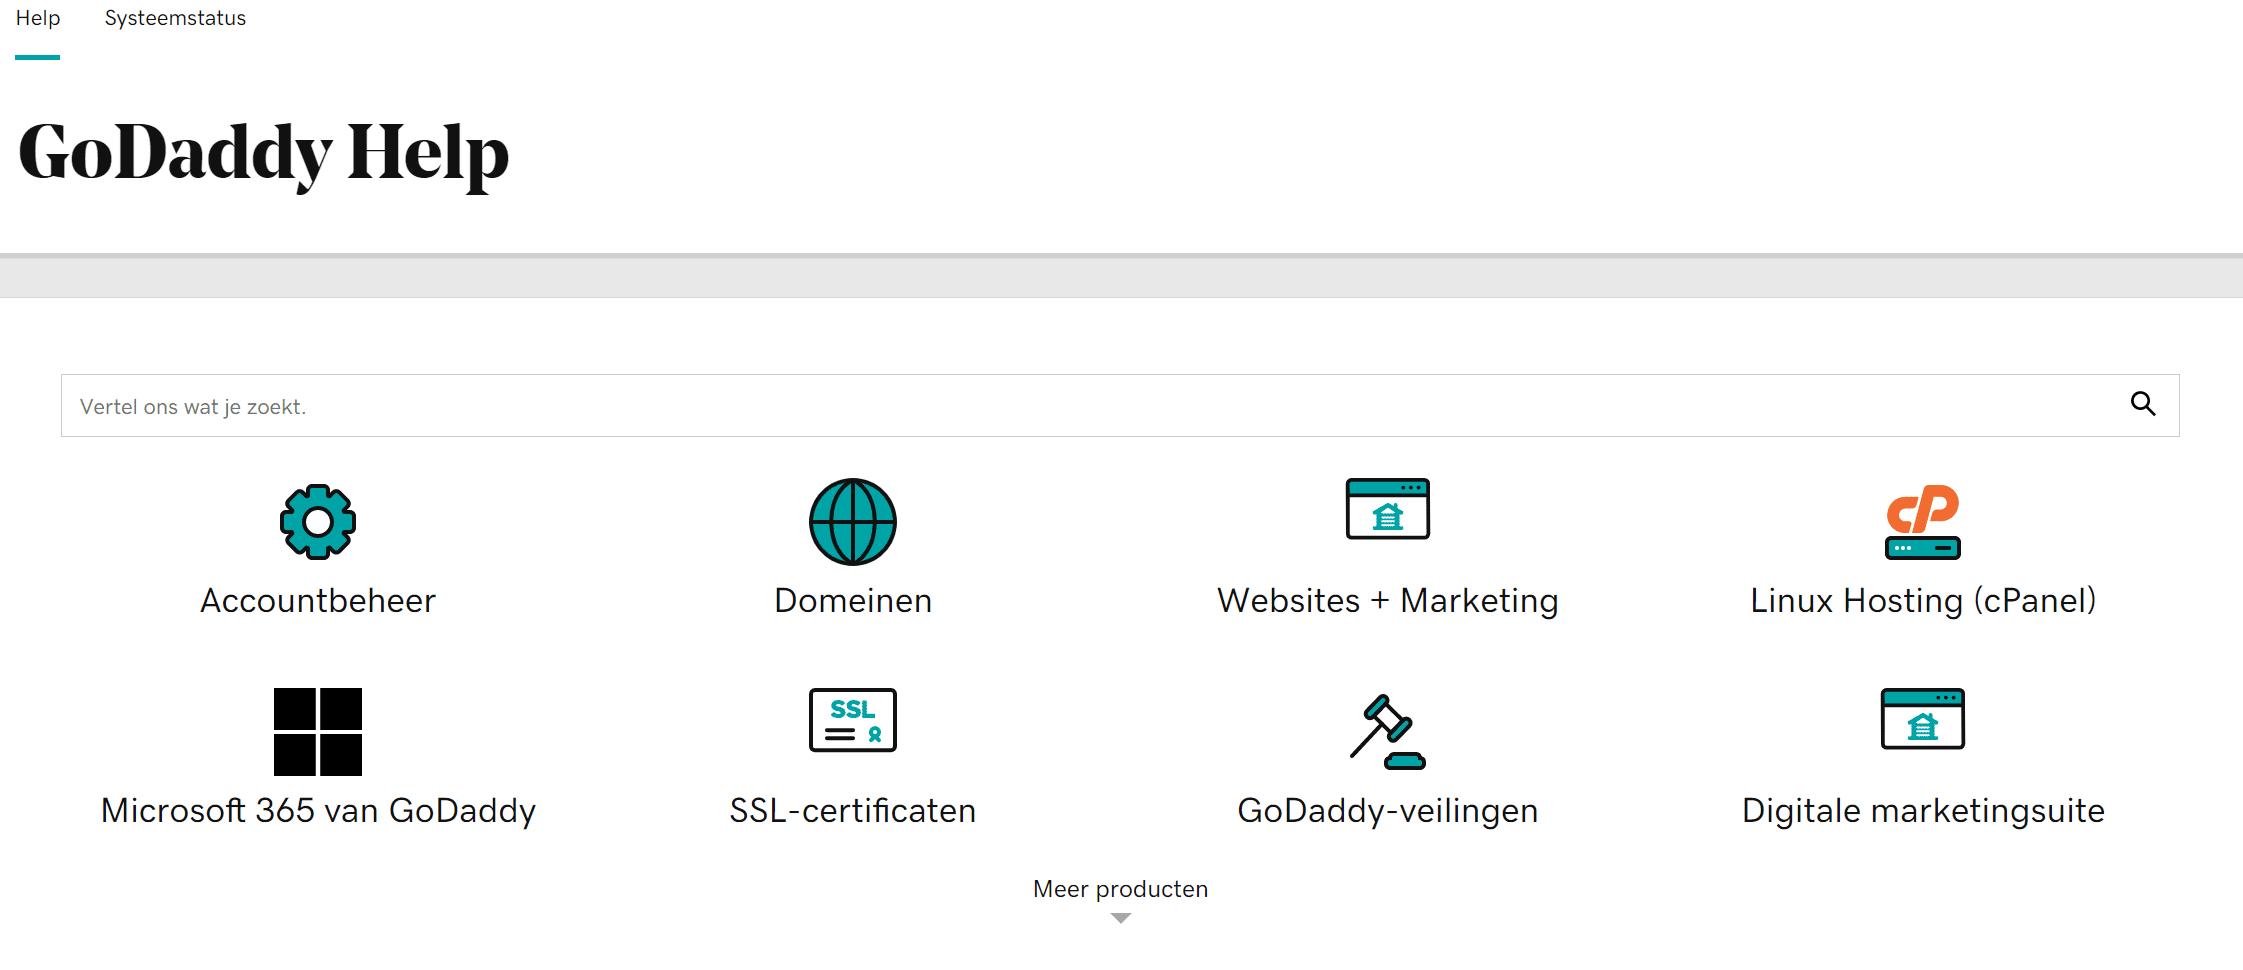 GoDaddy-klantenservice-review